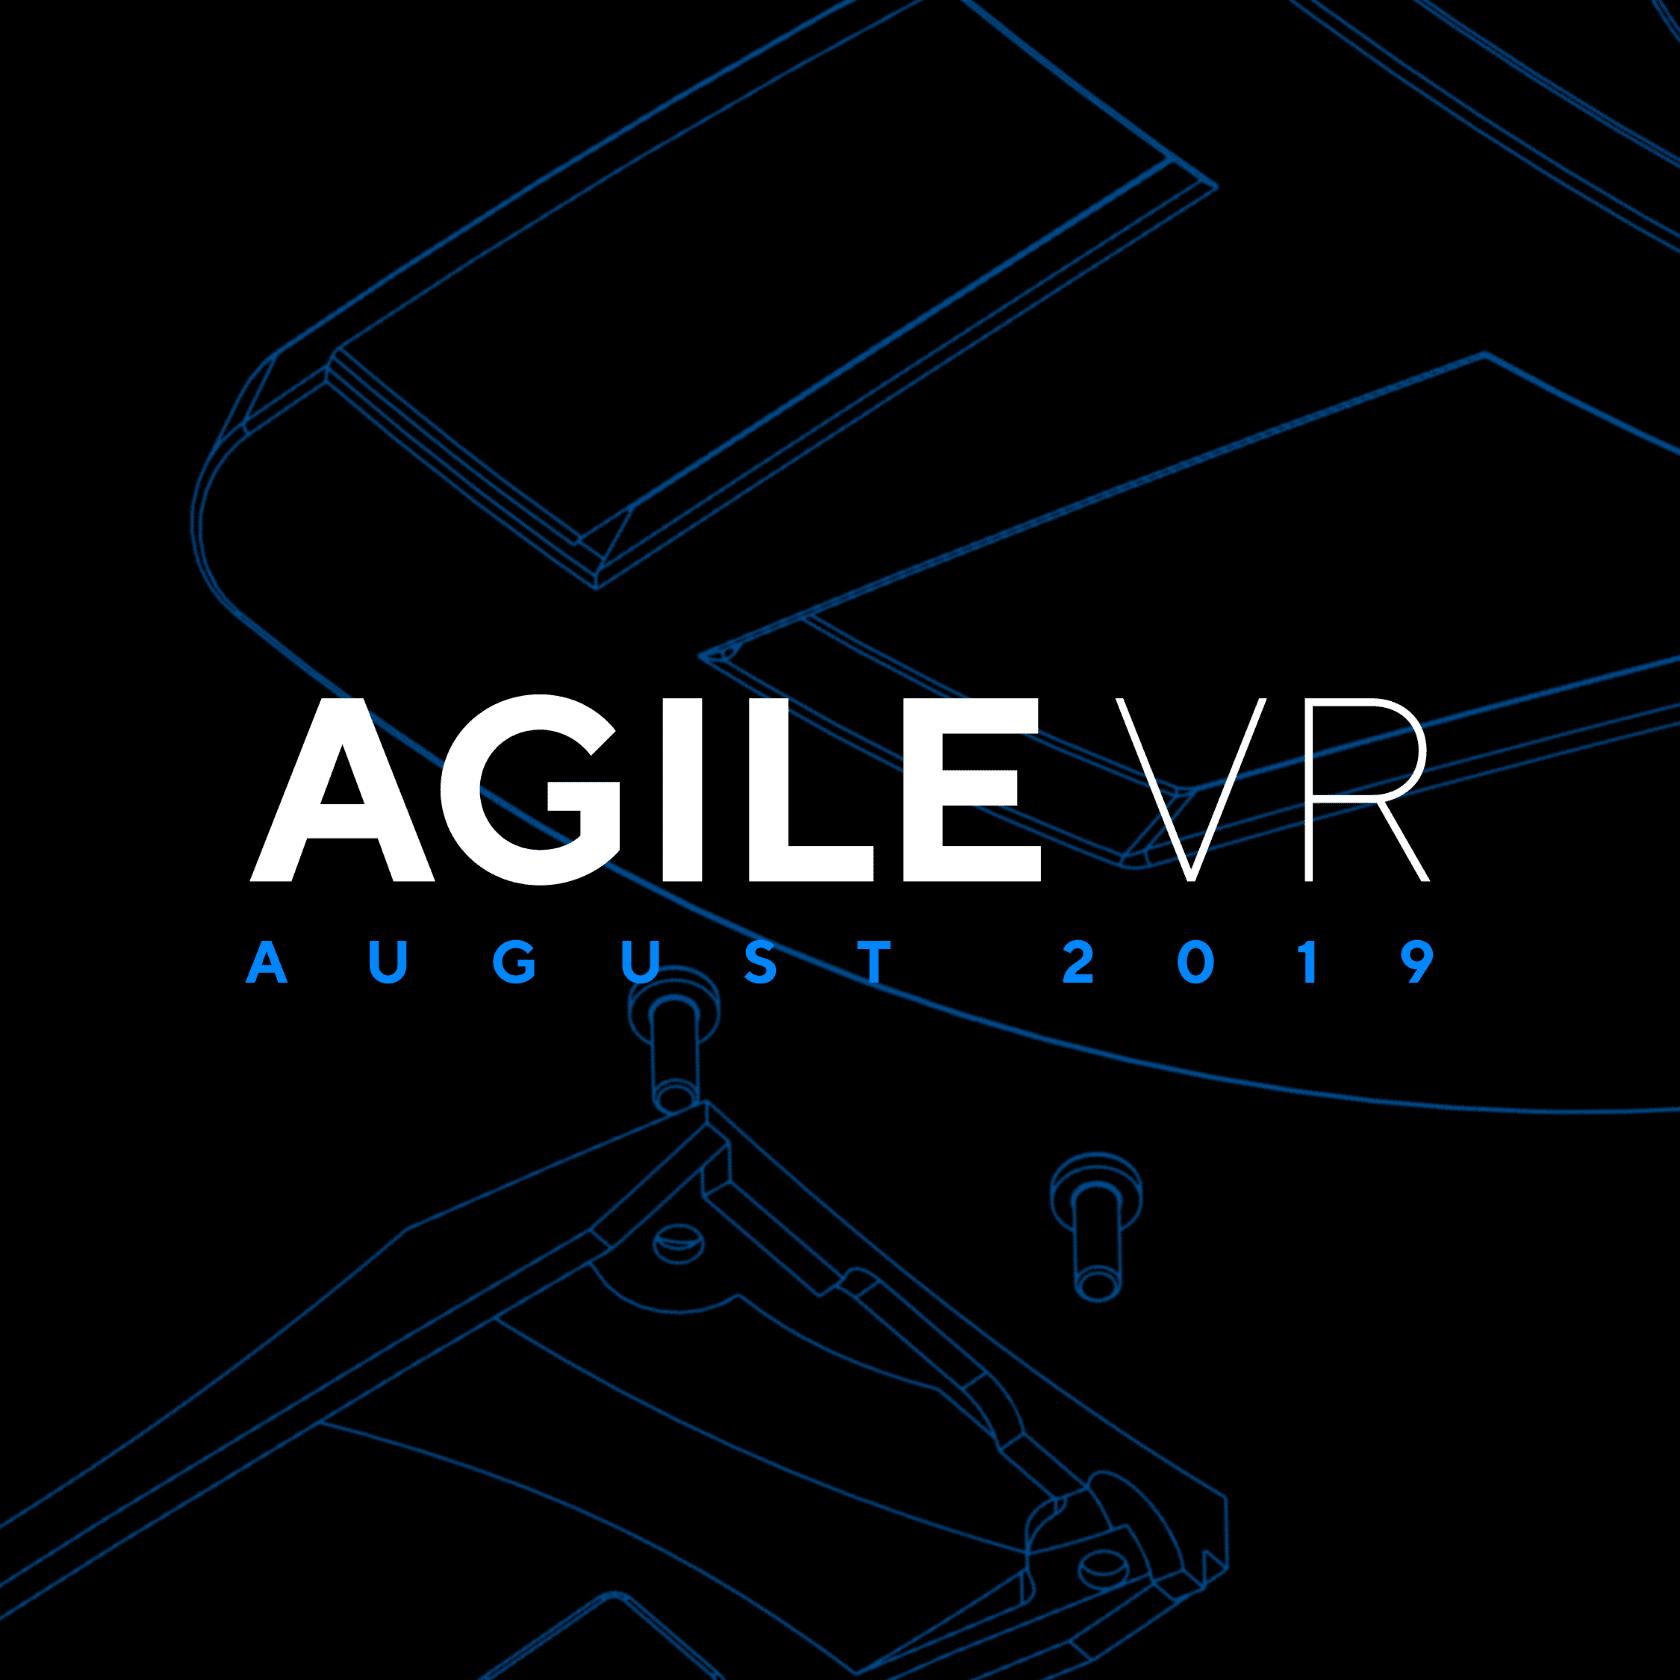 Mechatech - AgileVR product launch